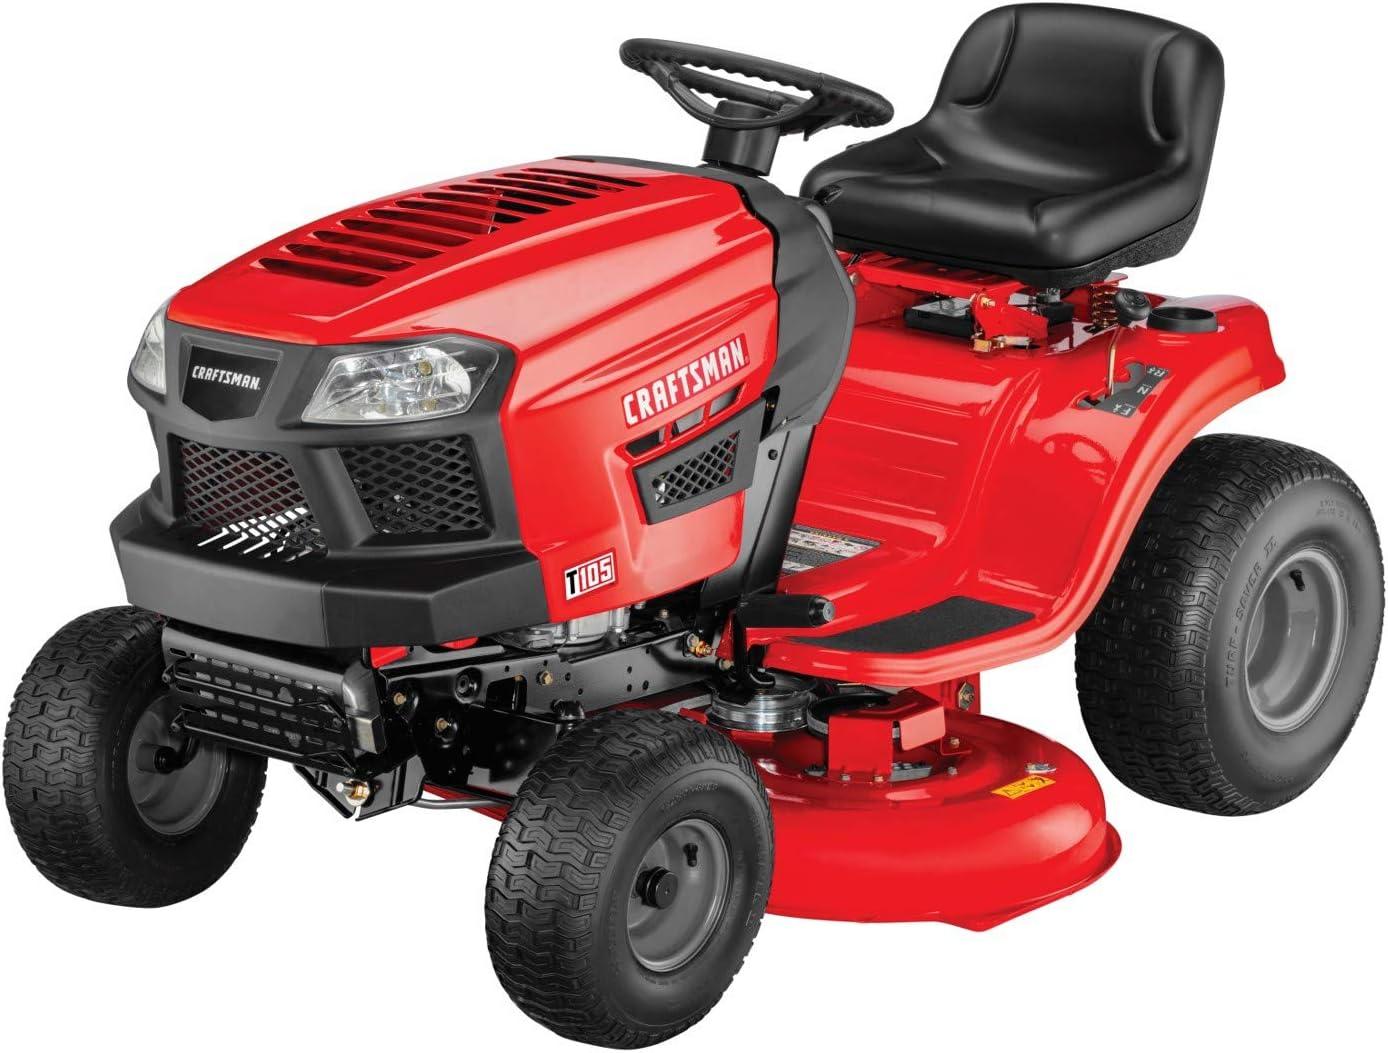 Craftsman T105 439cc Single Engine Series 42-Inch Gas Powered Riding Lawn Mower